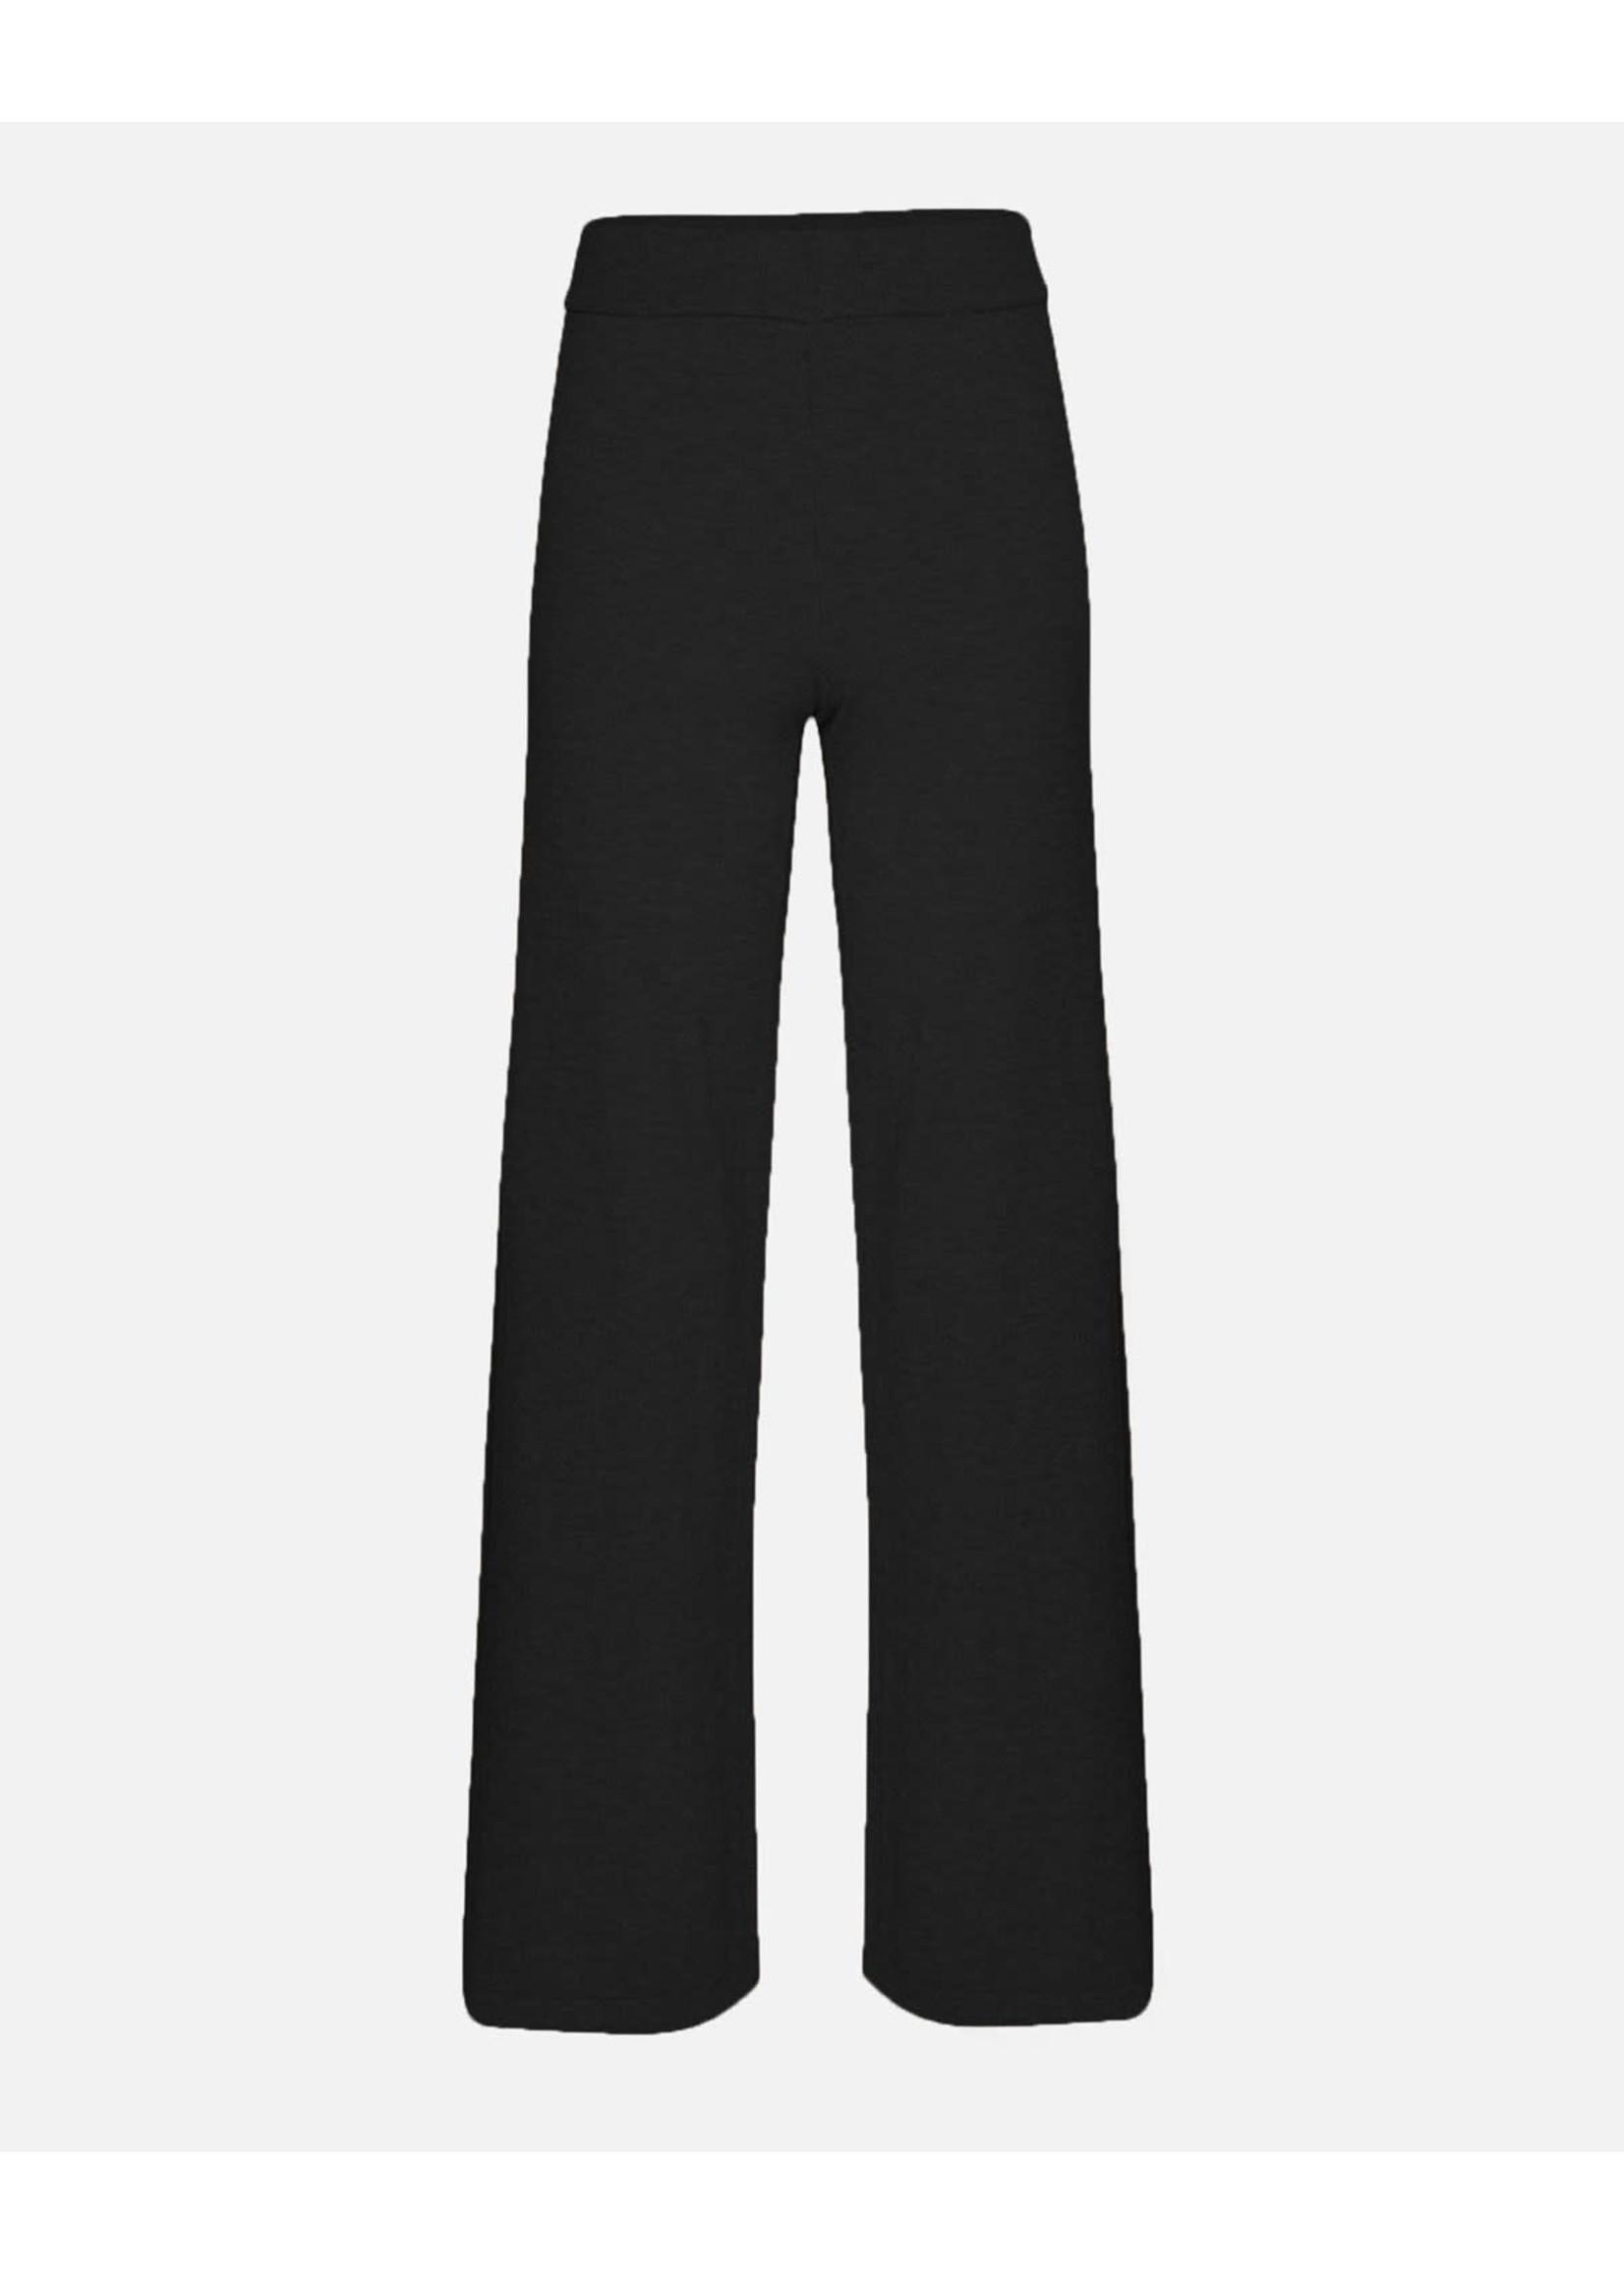 MSCH GALINE RACHELLE PANTS black